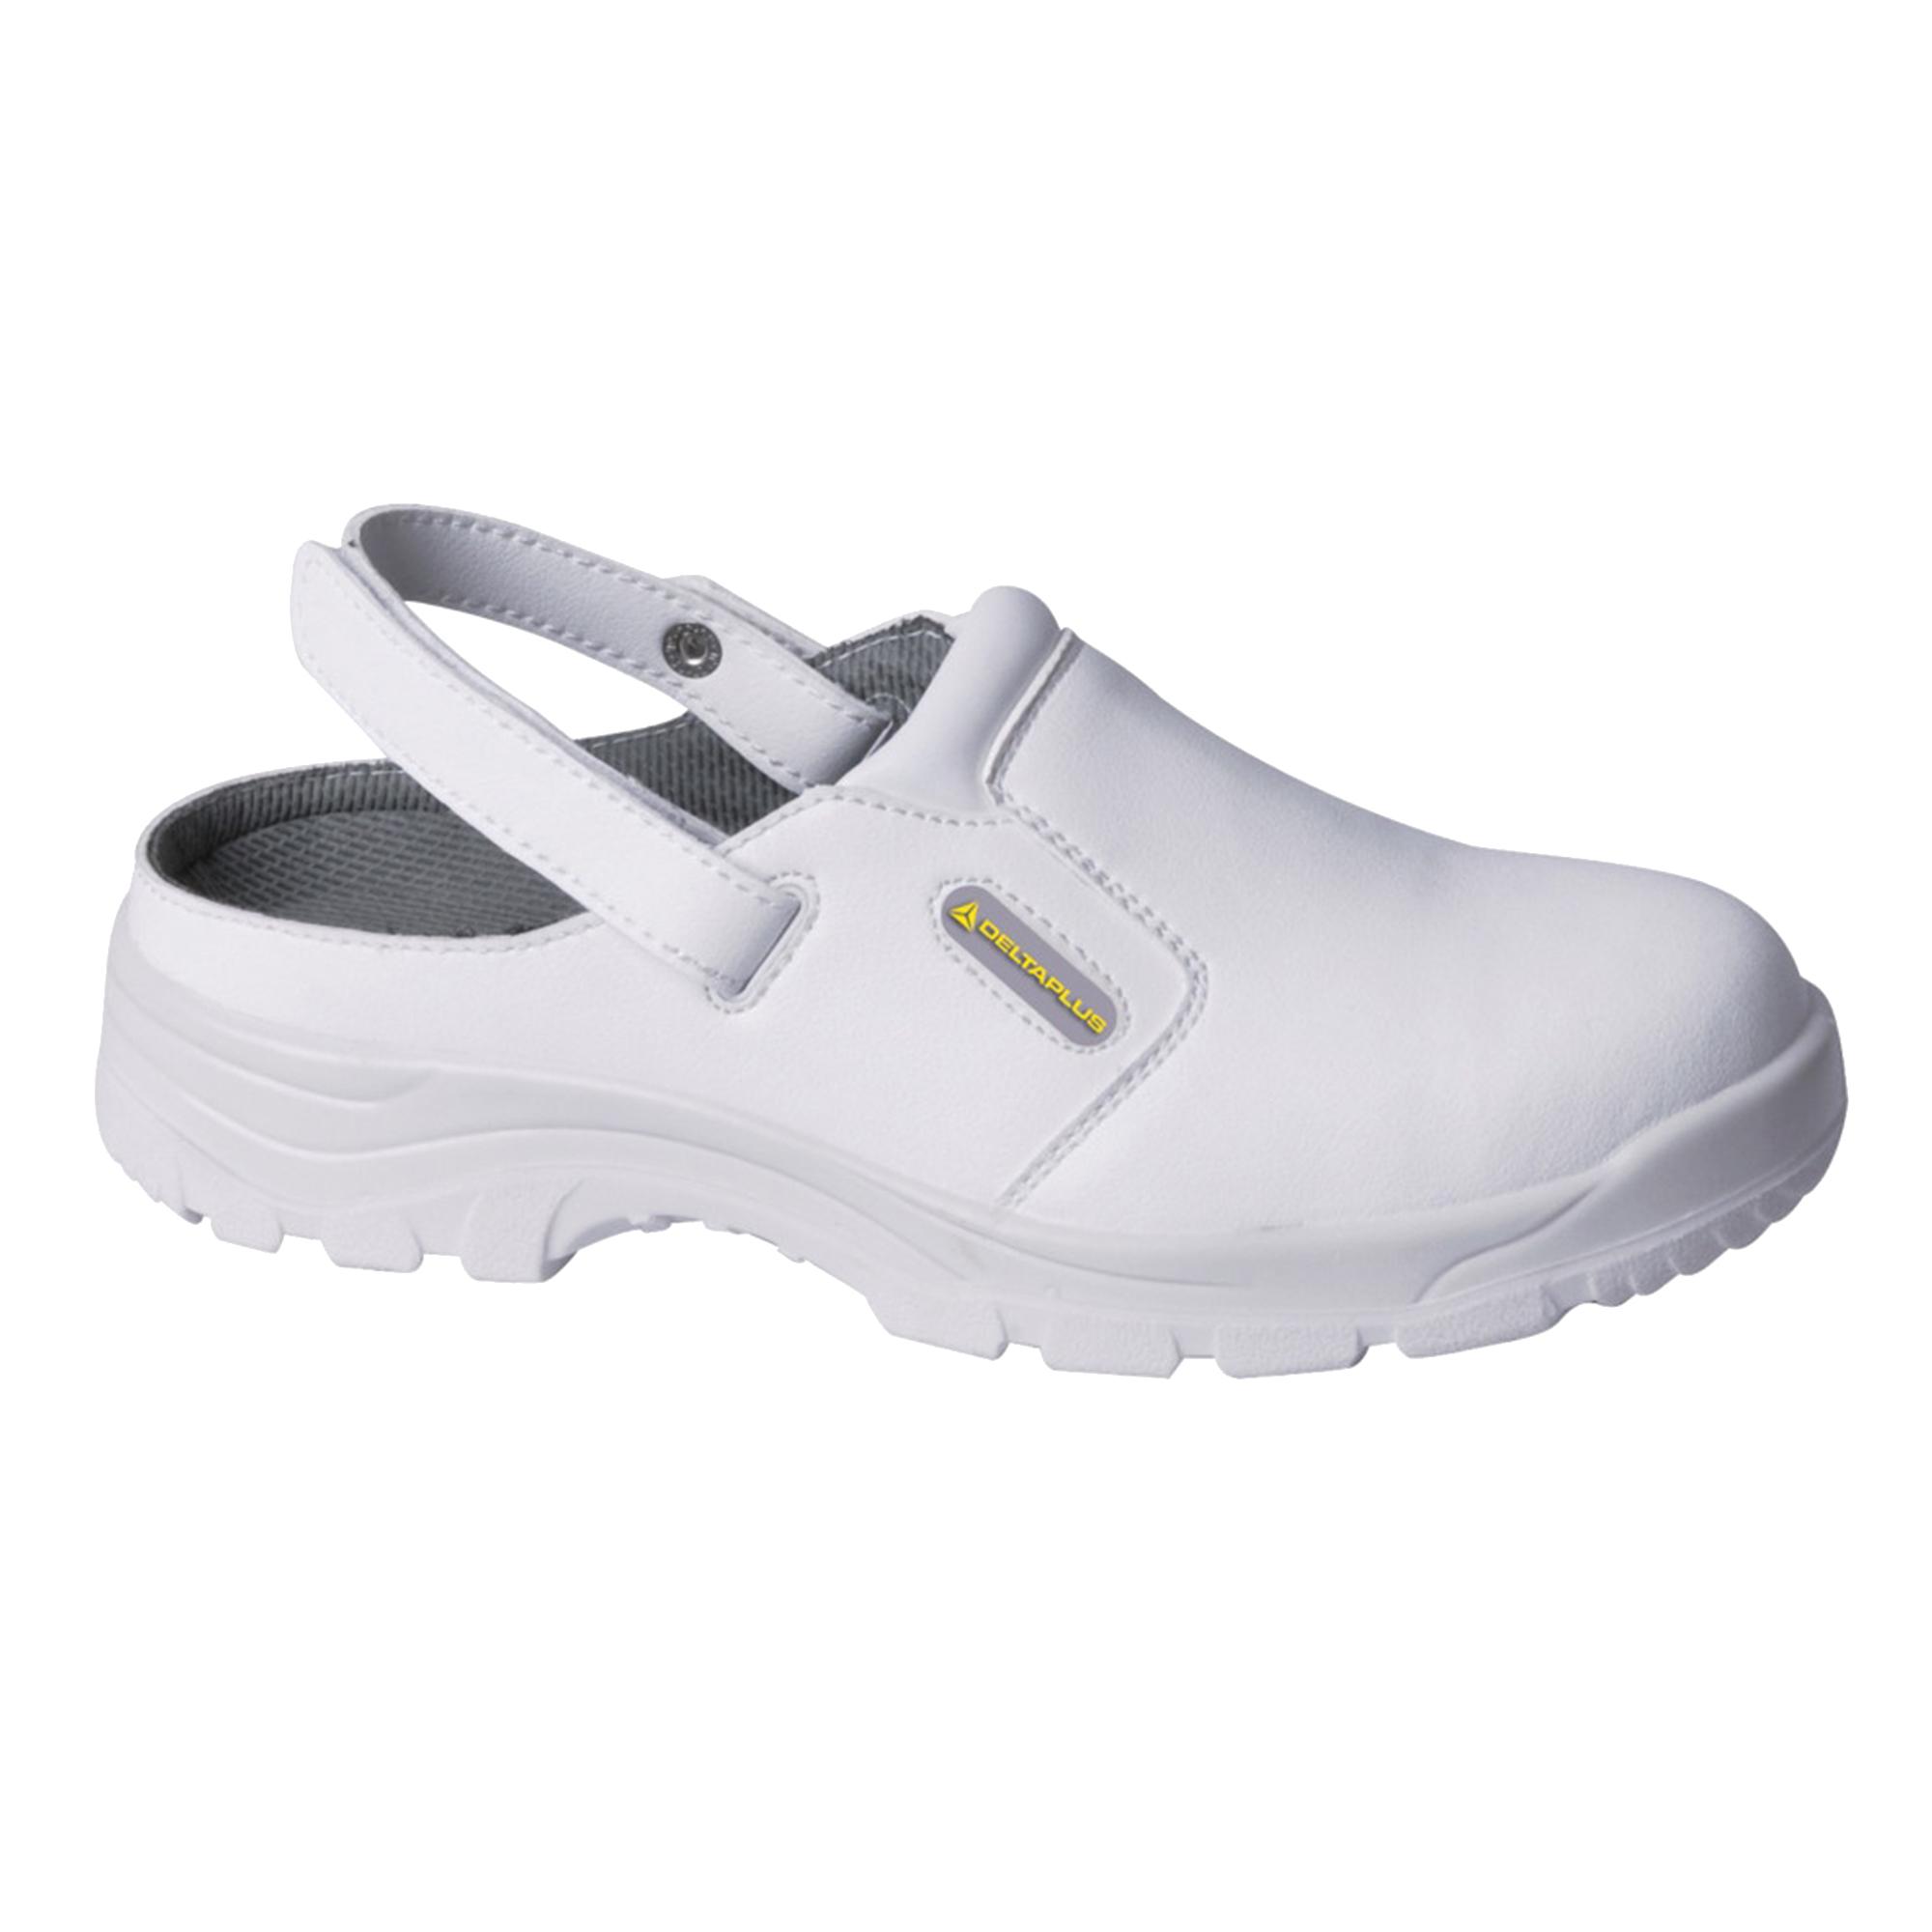 delta plus mens womens hygiene non slip safety clog shoes